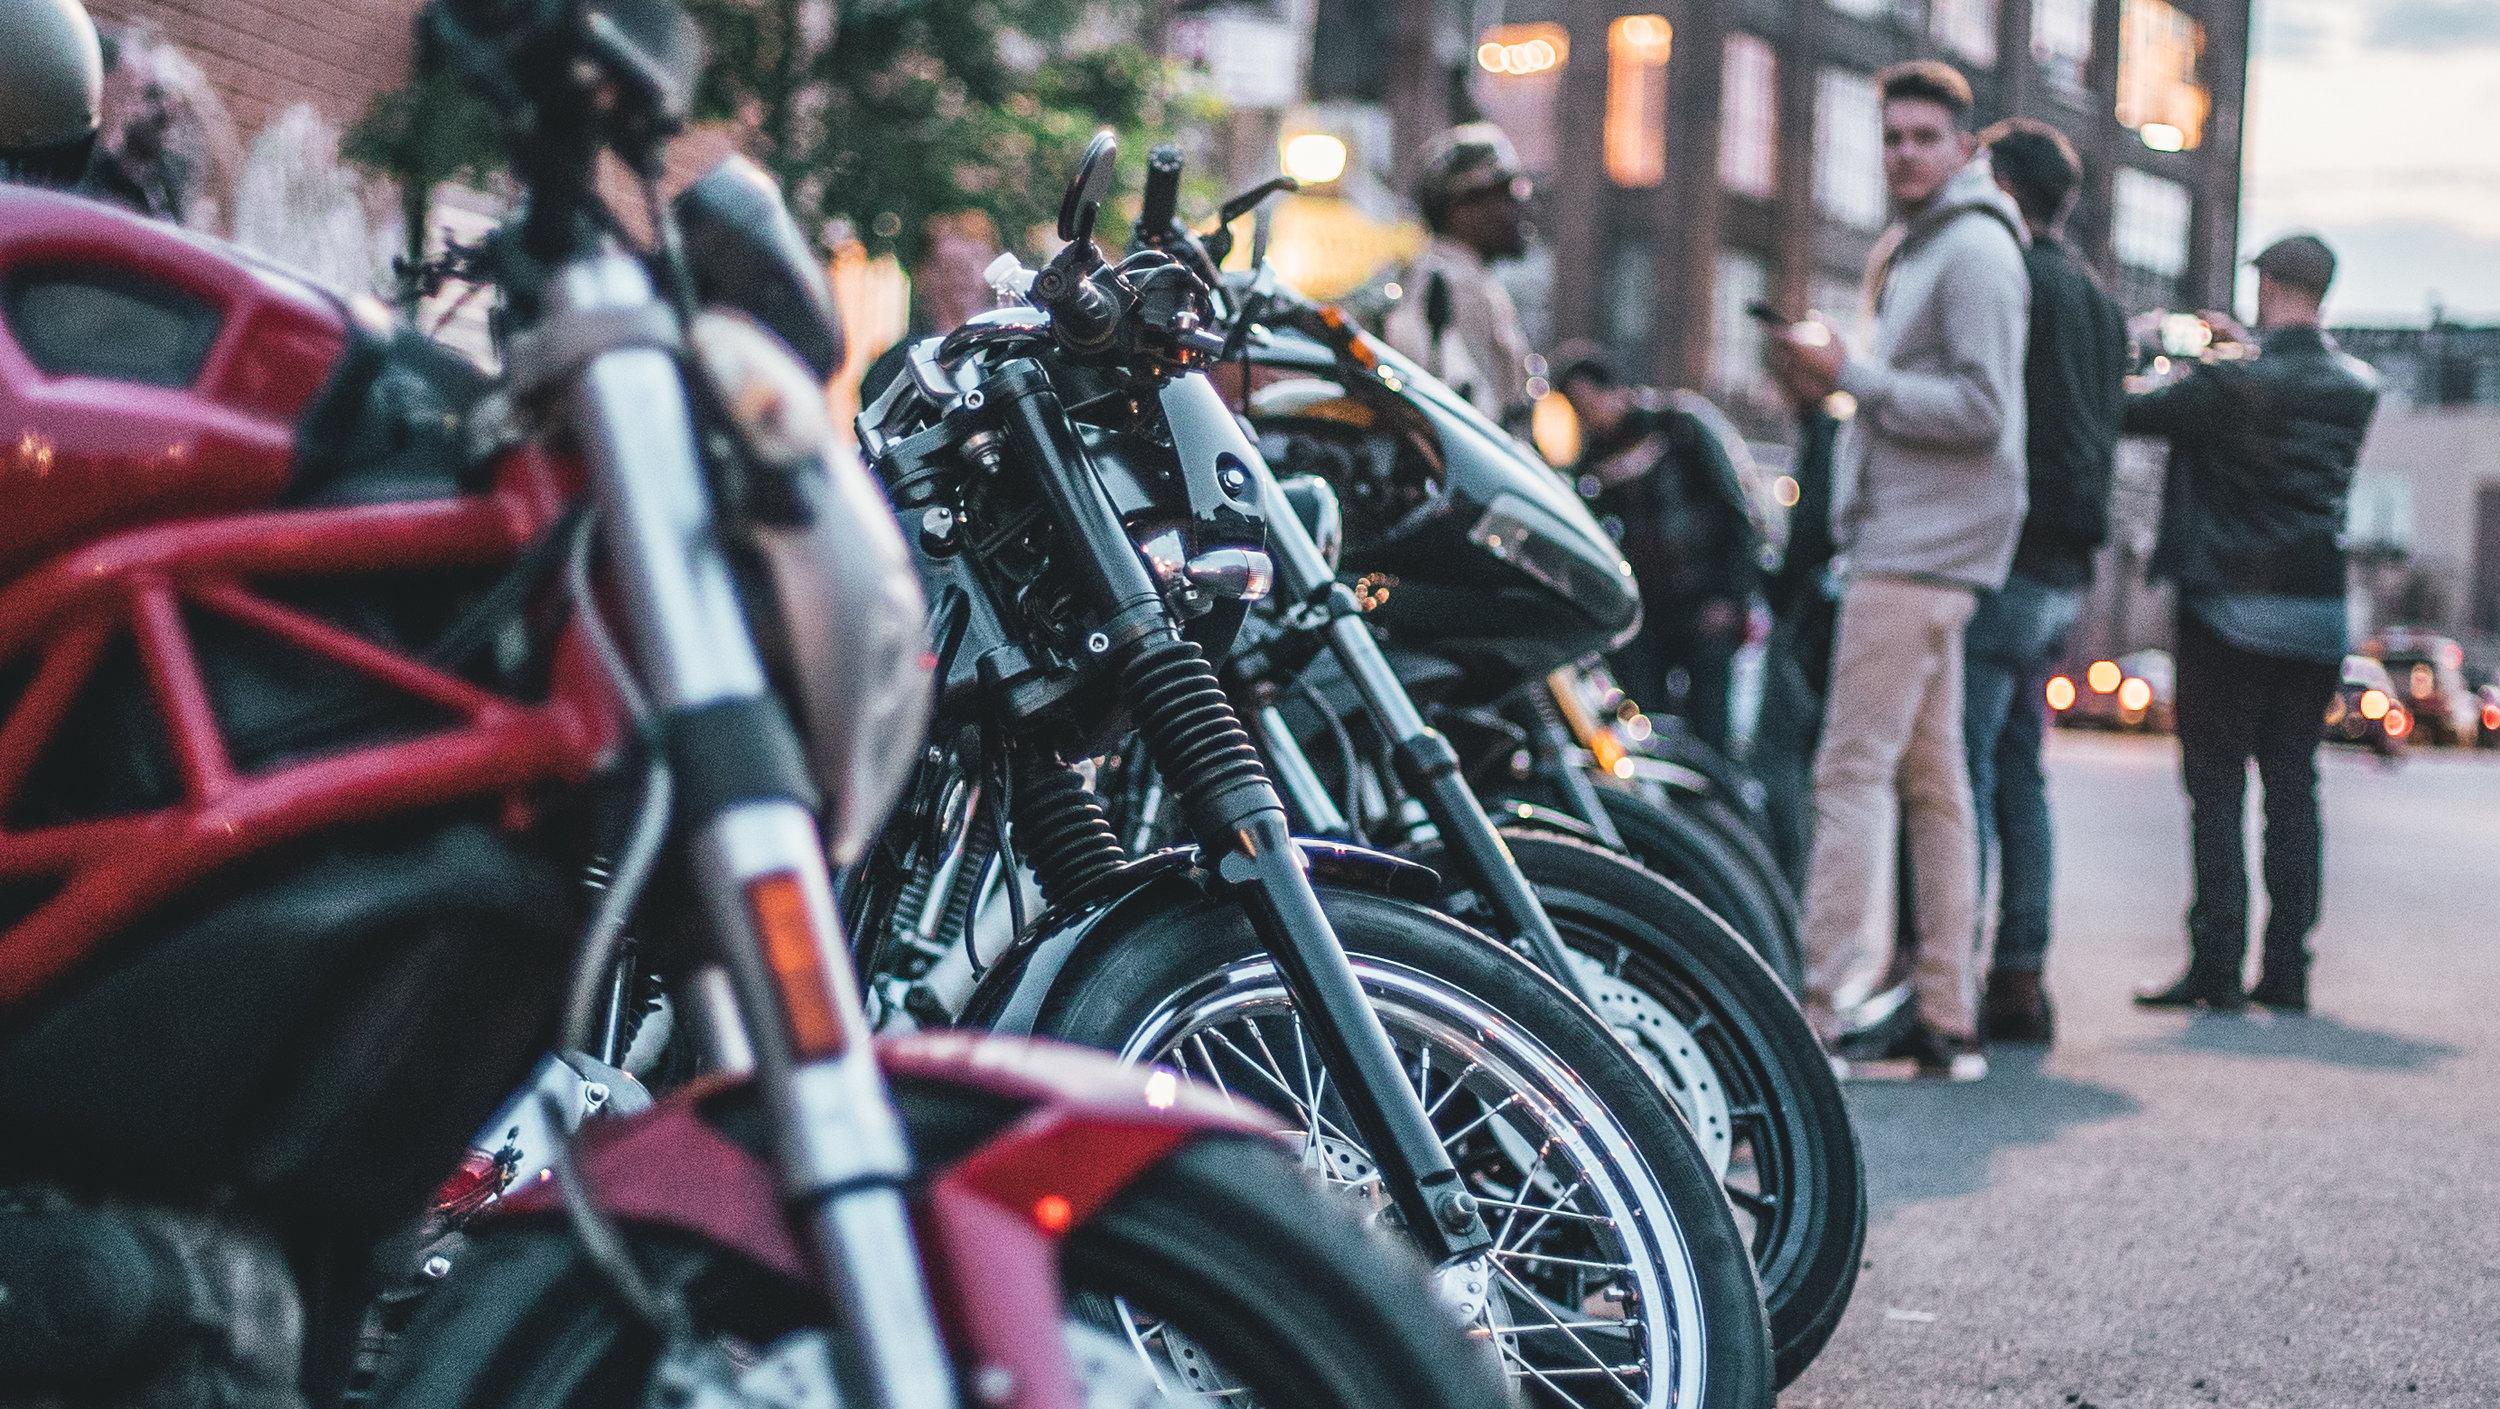 @lewis.tobias_#TheMotoSocialNEWYORK_June7,2018_Kávé Esspresso Bar (11 of 34).jpg